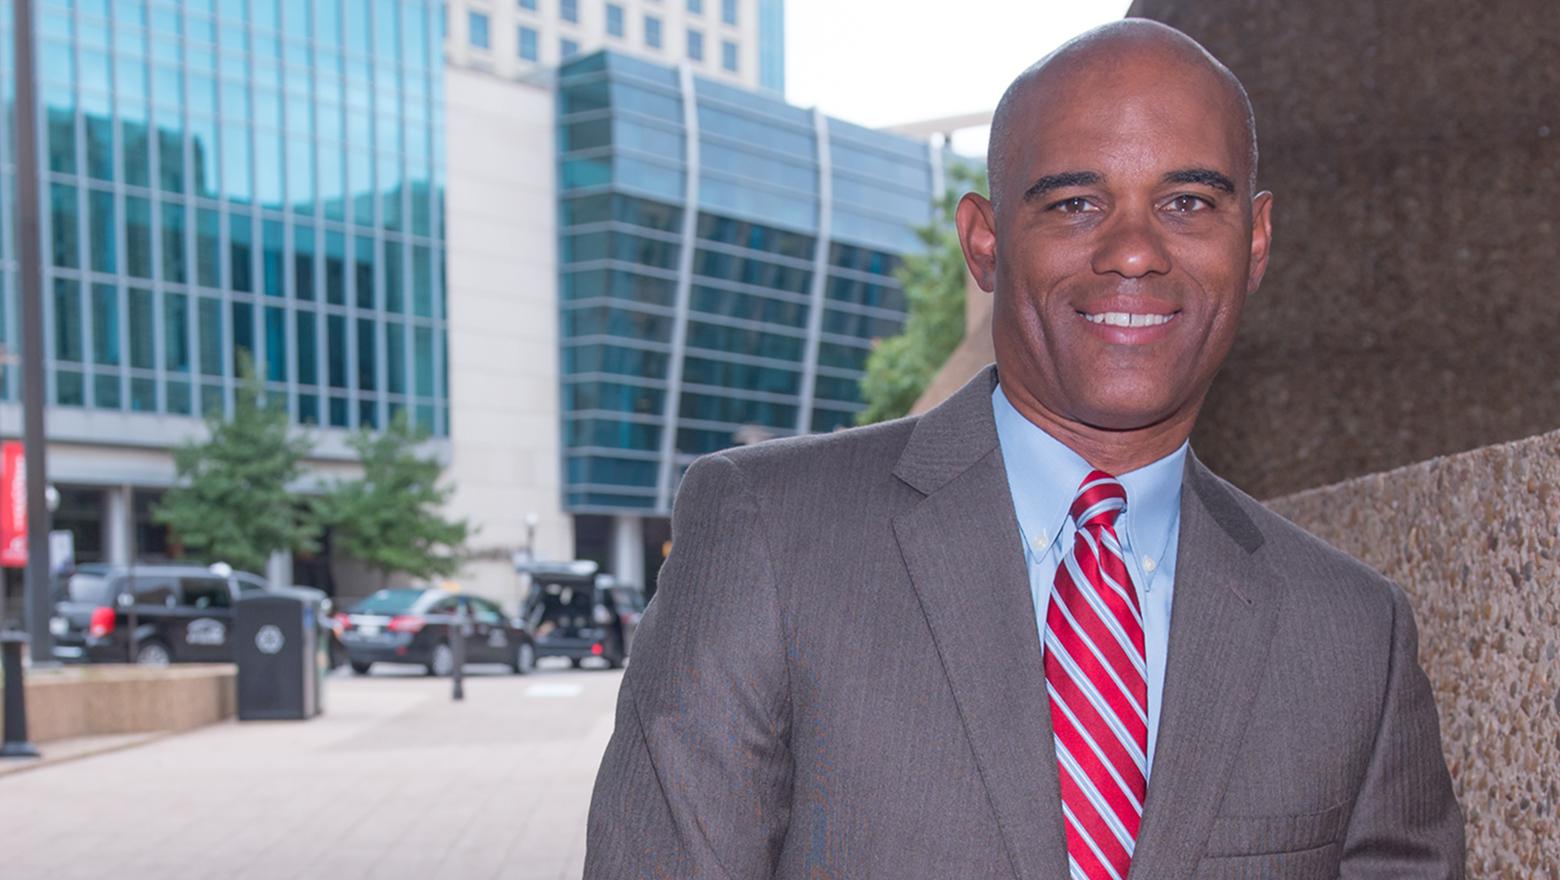 Texas A&M University School of Law Professor Thomas W. Mitchell